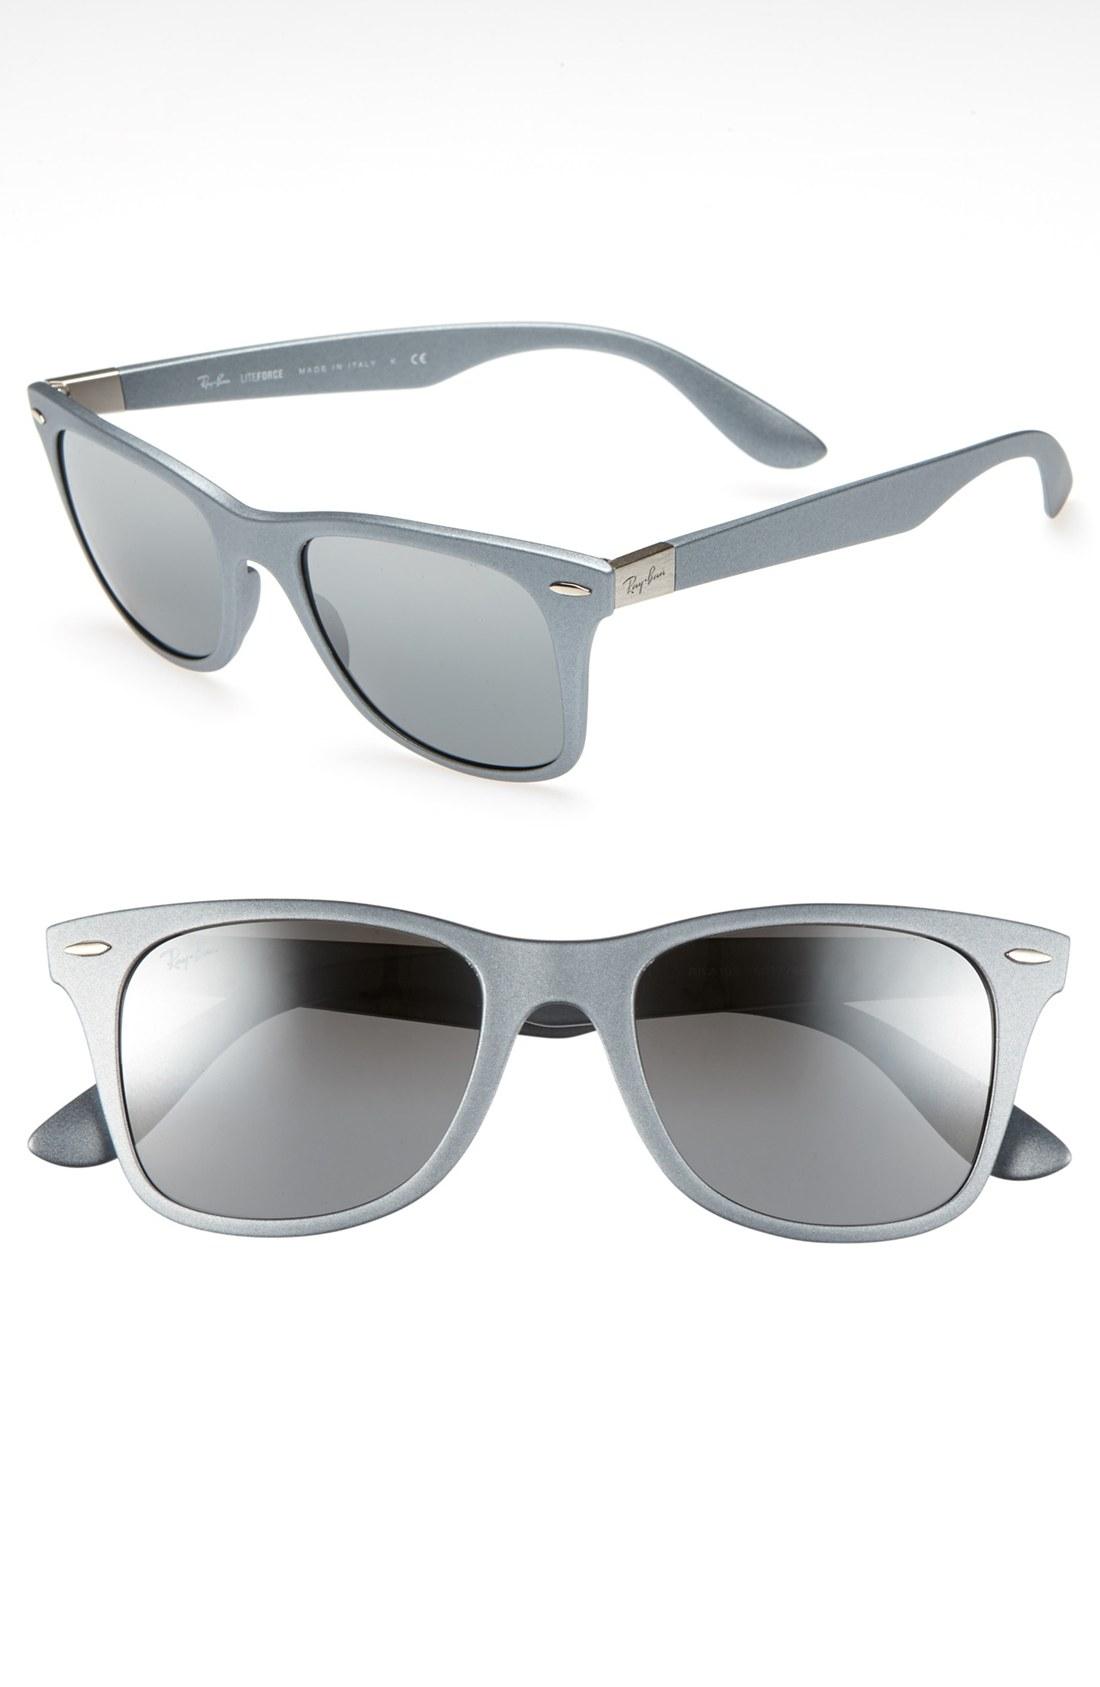 Ray ban 52mm sunglasses in silver silver mirror lyst for Mirror sunglasses